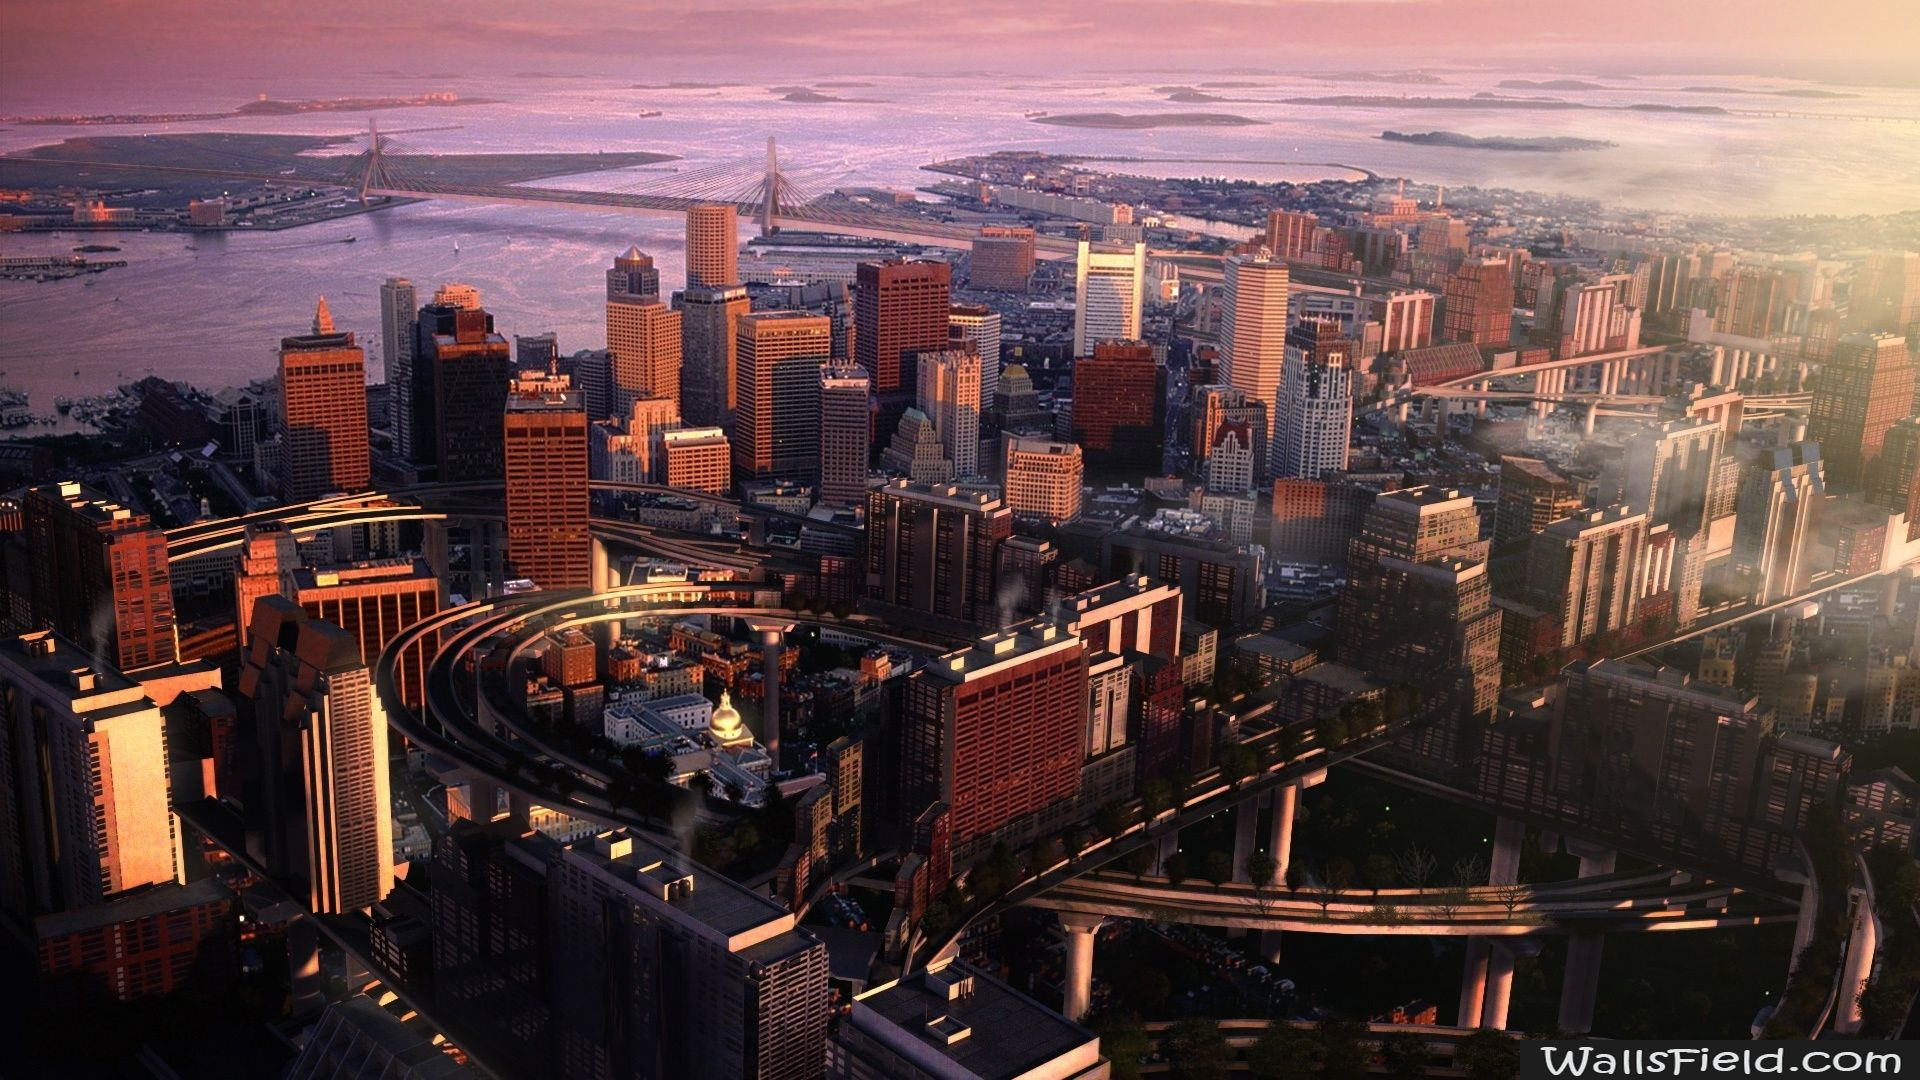 Boston Panorama Wallsfield Com Free Hd Wallpapers Boston Wallpaper Skyline Image City Wallpaper